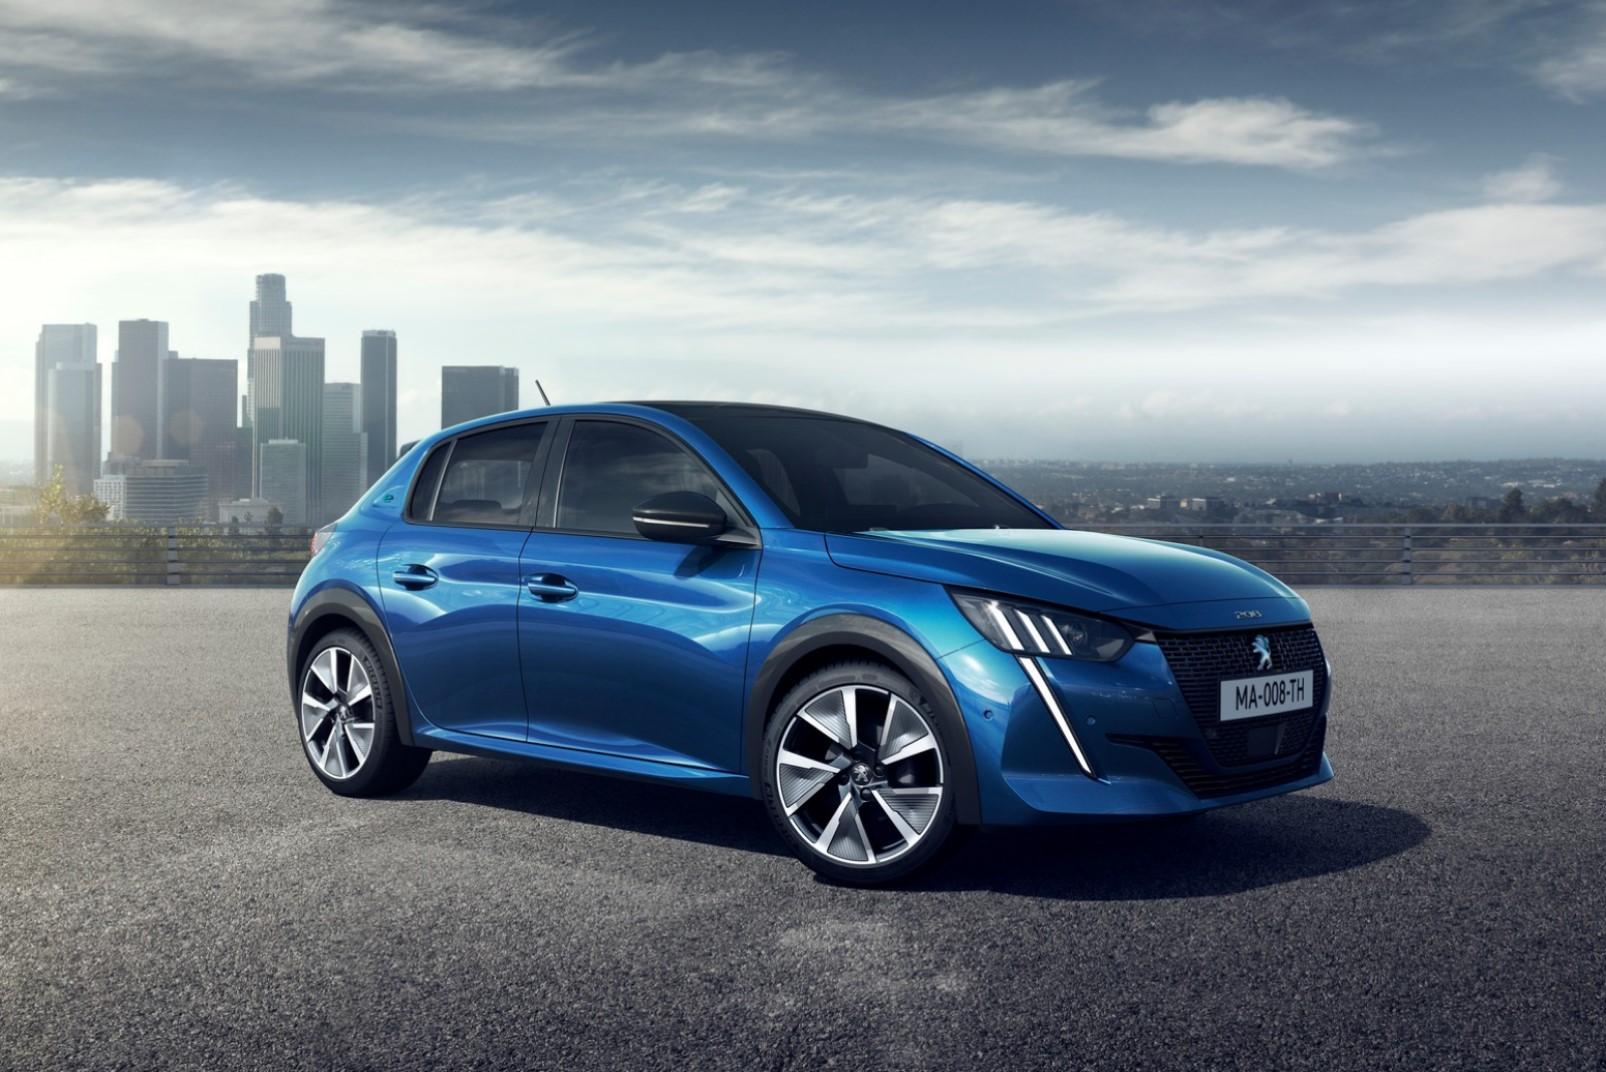 Peugeot 208 Geneva Motor Show